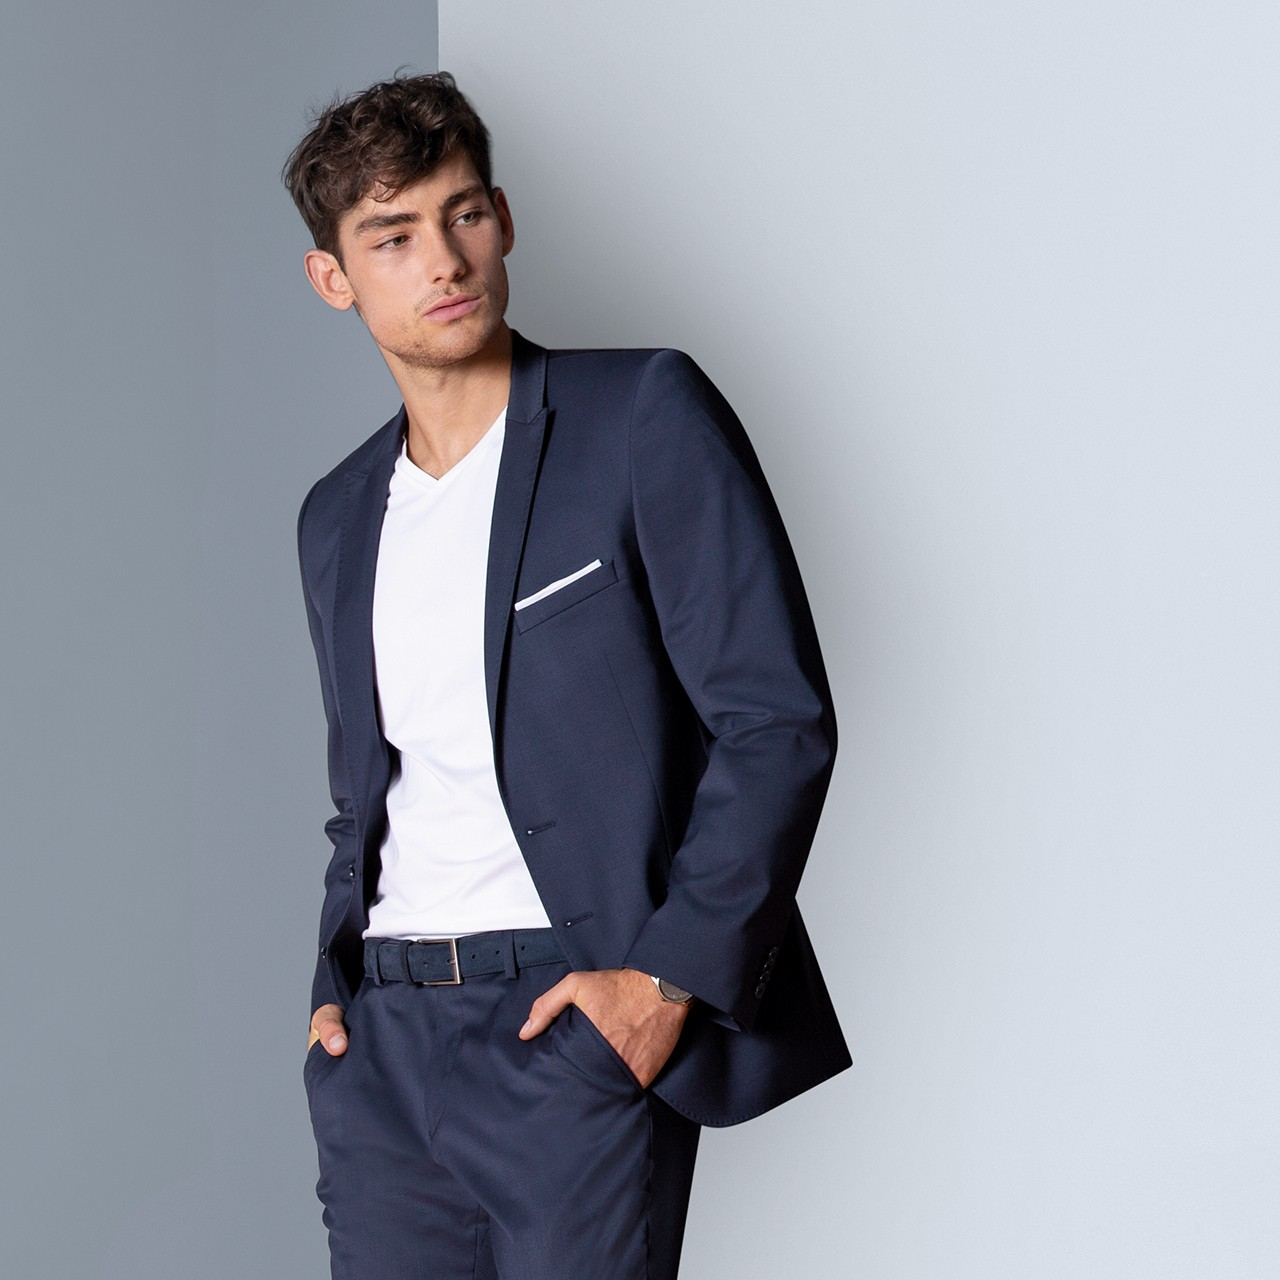 Herren Sakko Modern Slim Fit Greiff® | bedrucken, besticken, bedrucken lassen, besticken lassen, mit Logo |